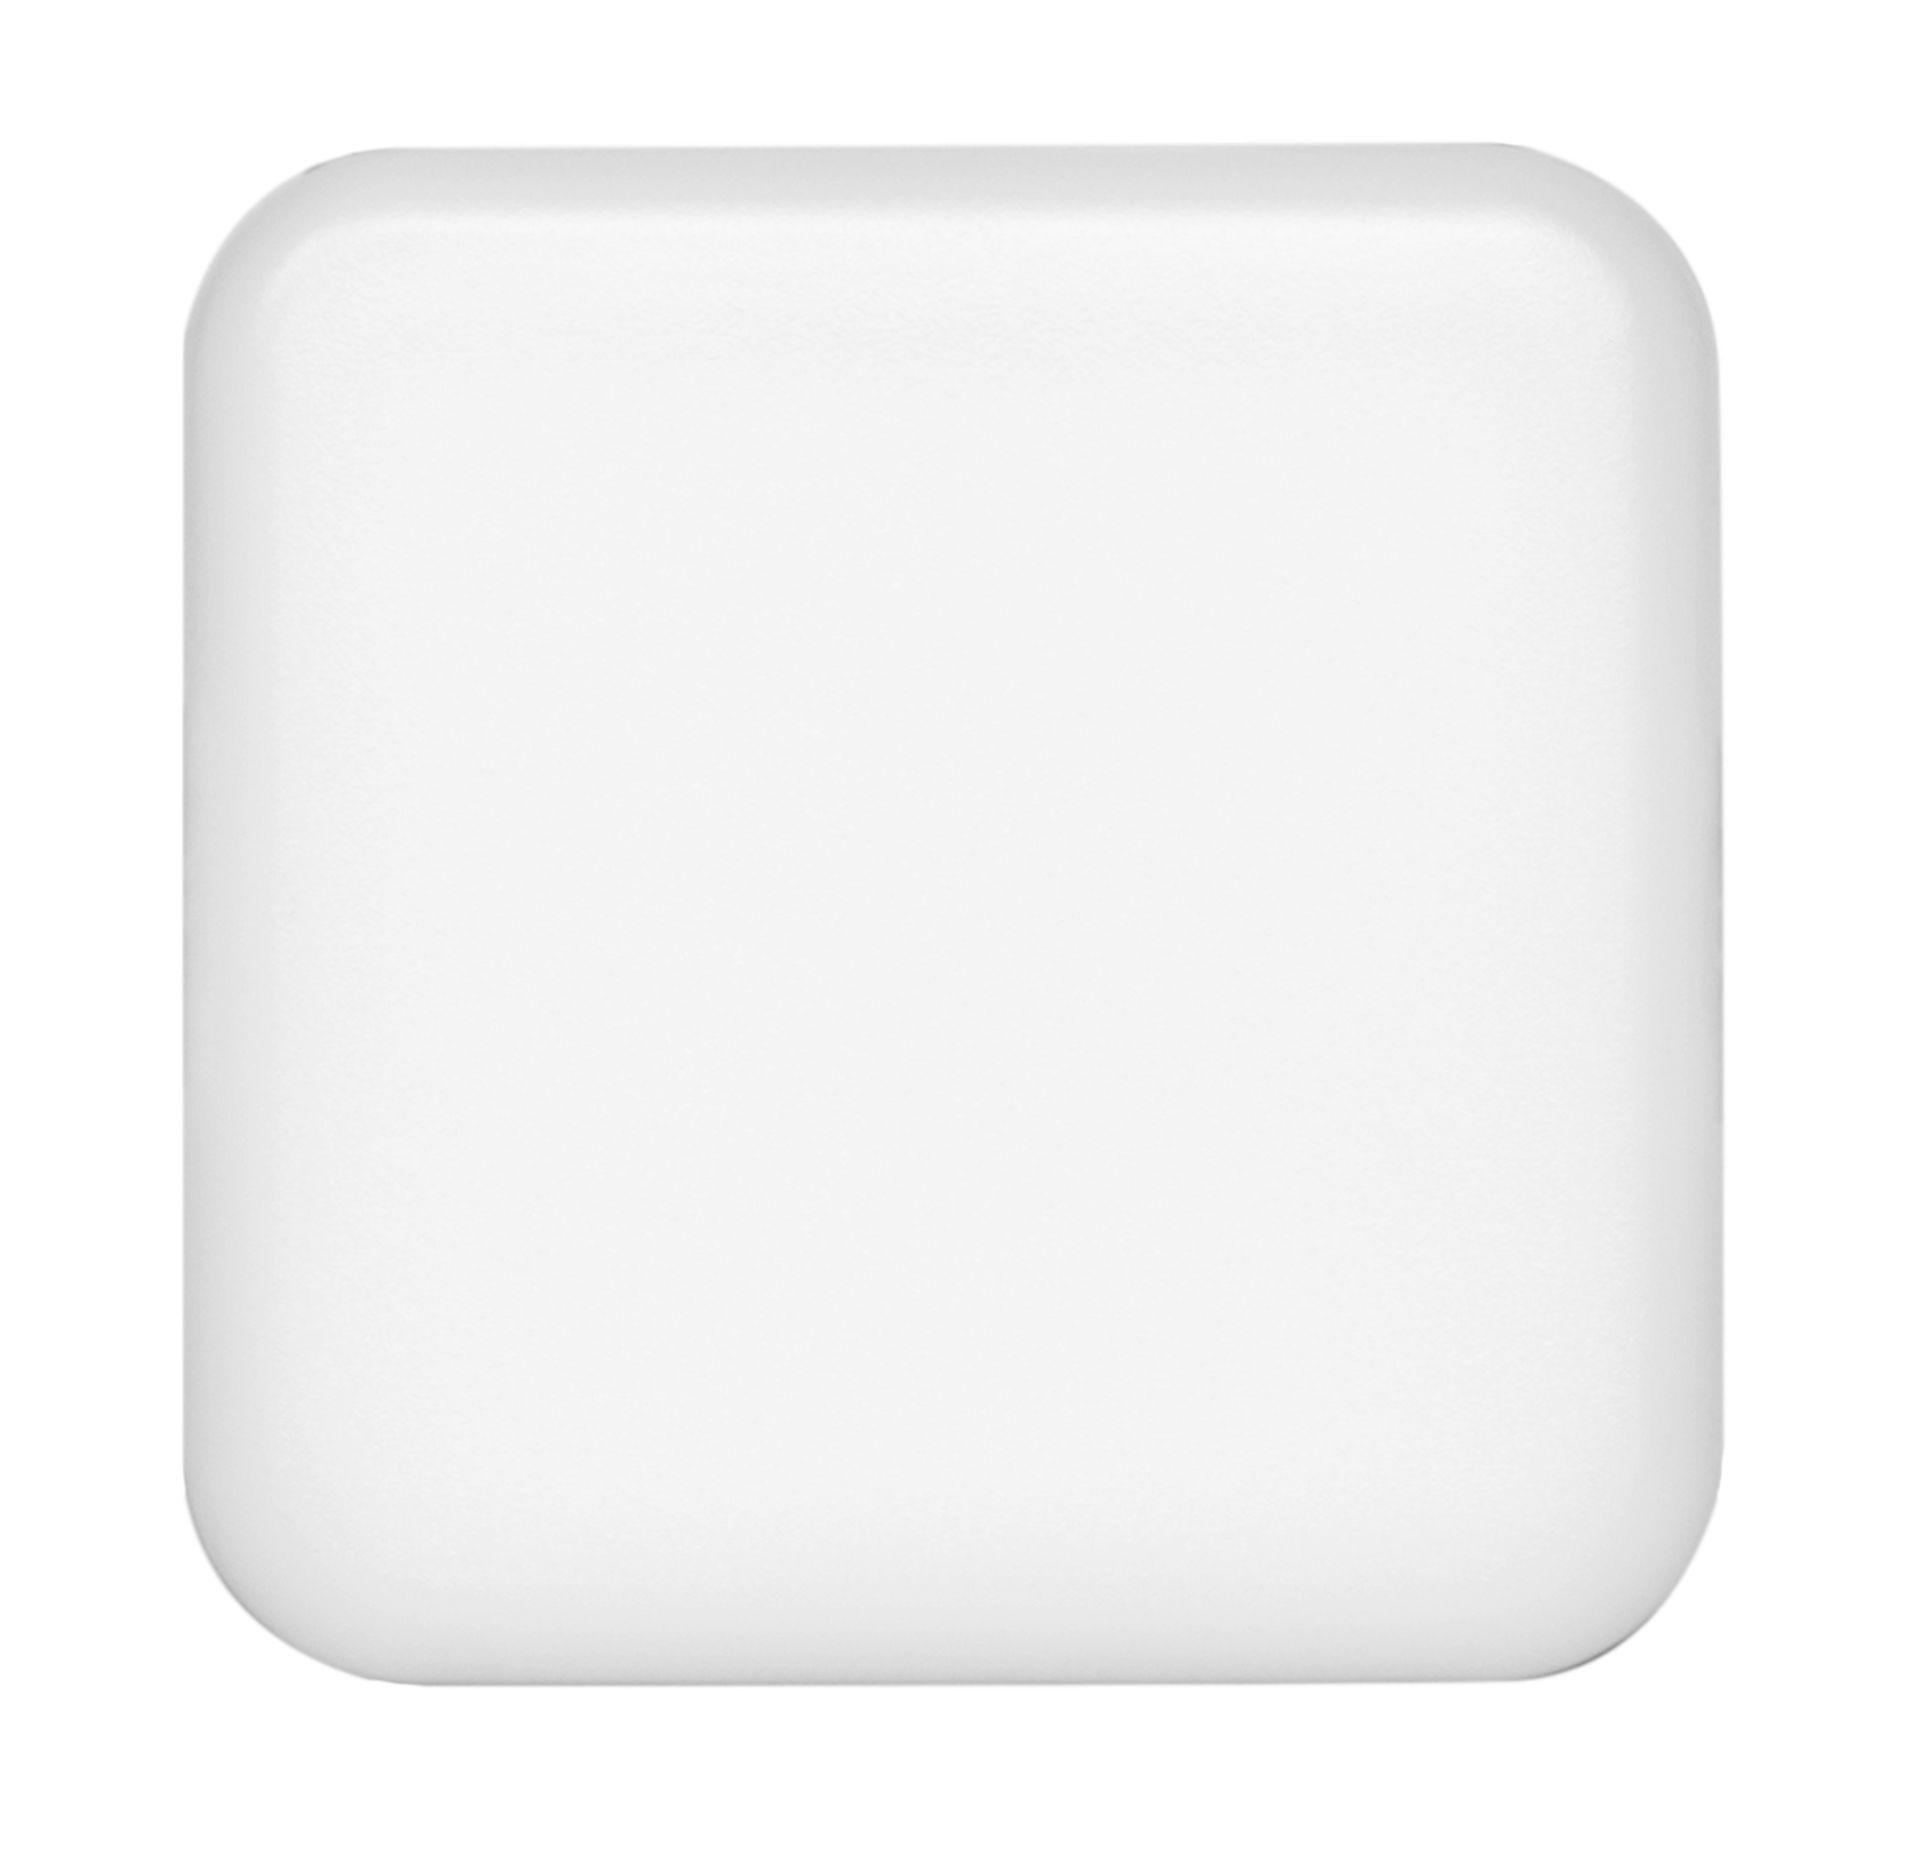 Ecolite Biely vstavaný LED panel hranatý 75 x 75mm 6W IP65 LED-NS-6W/IP66